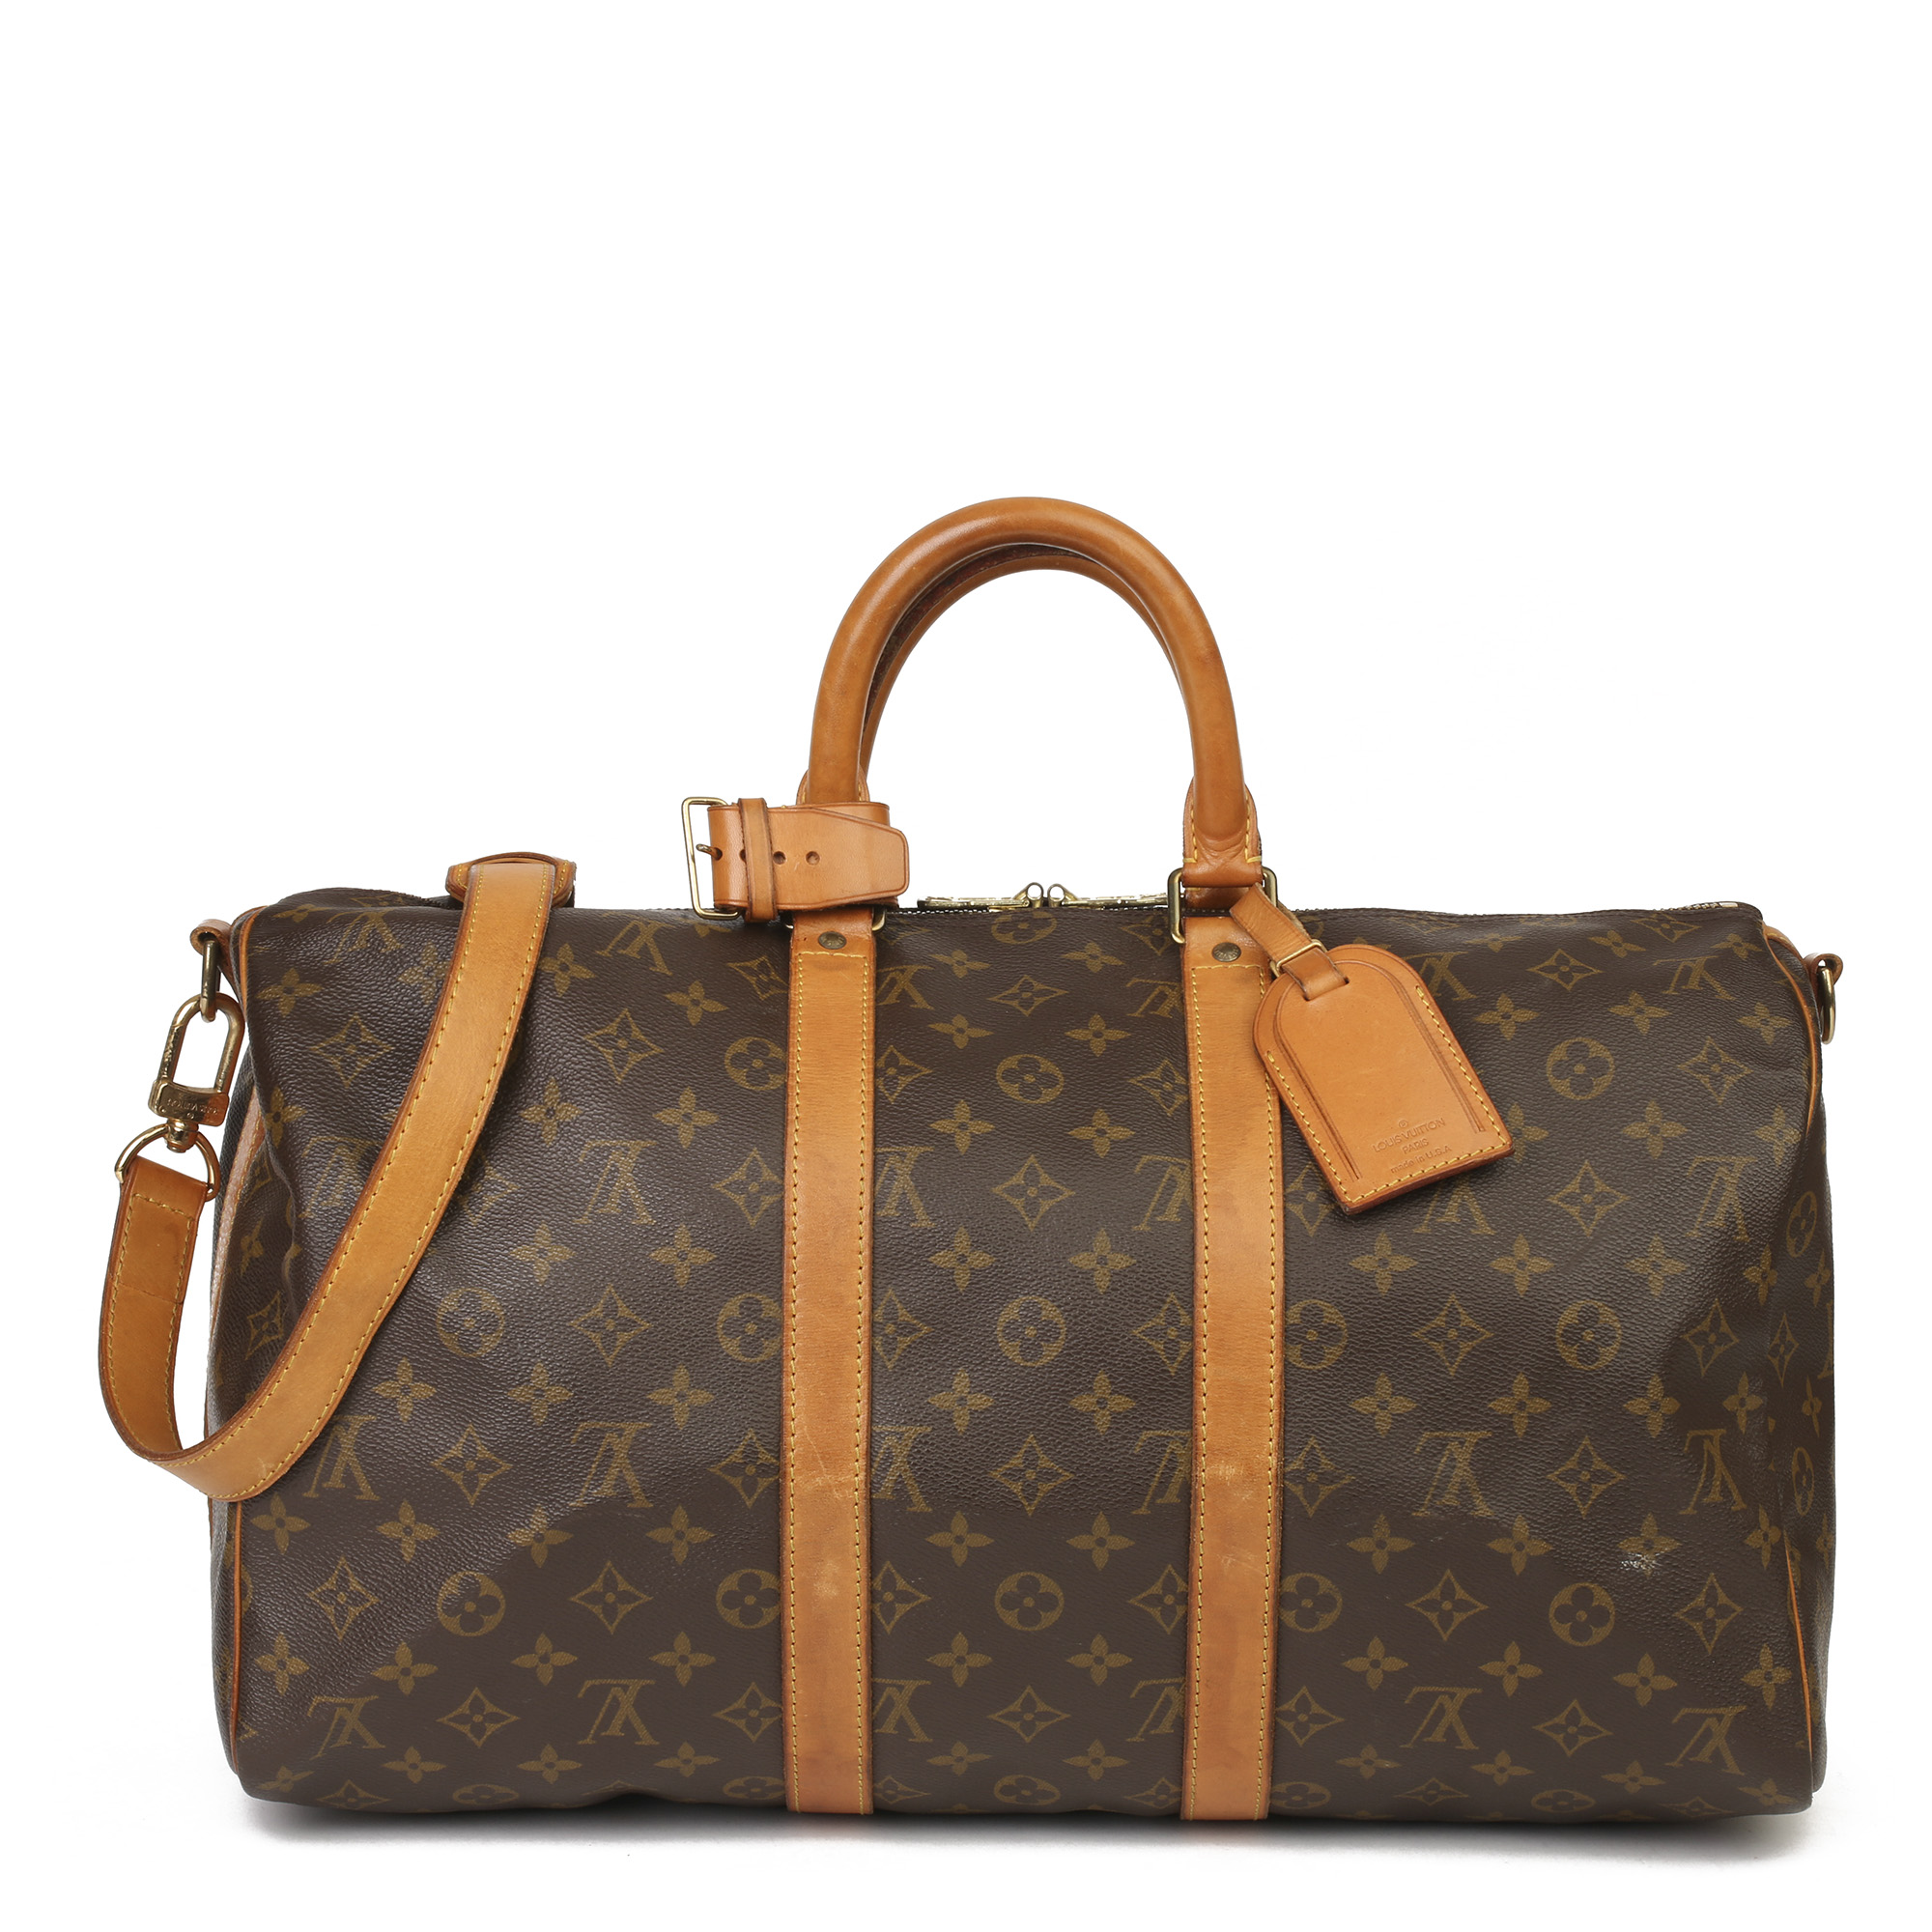 Louis Vuitton Brown Monogram Coated Canvas & Vachetta Leather Vintage Keepall 45 Bandoulire